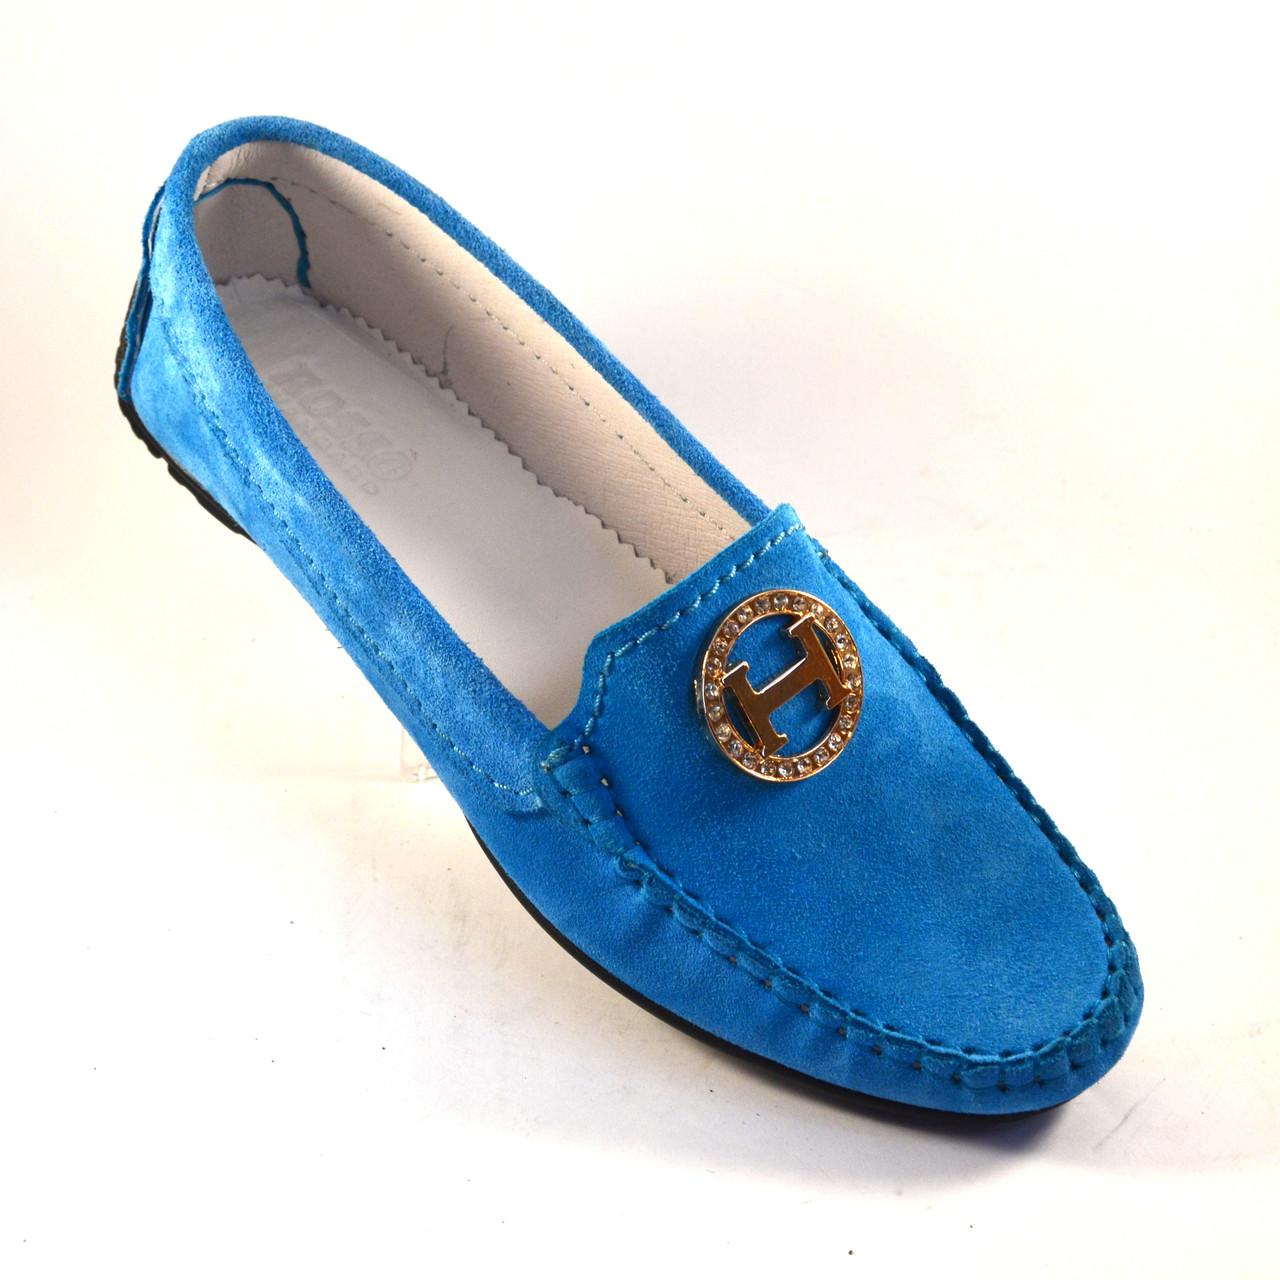 "Большой размер мокасины женские замшевые Ornella Blu Sky Vel BS by Rosso Avangard цвет голубой ""Небо"""